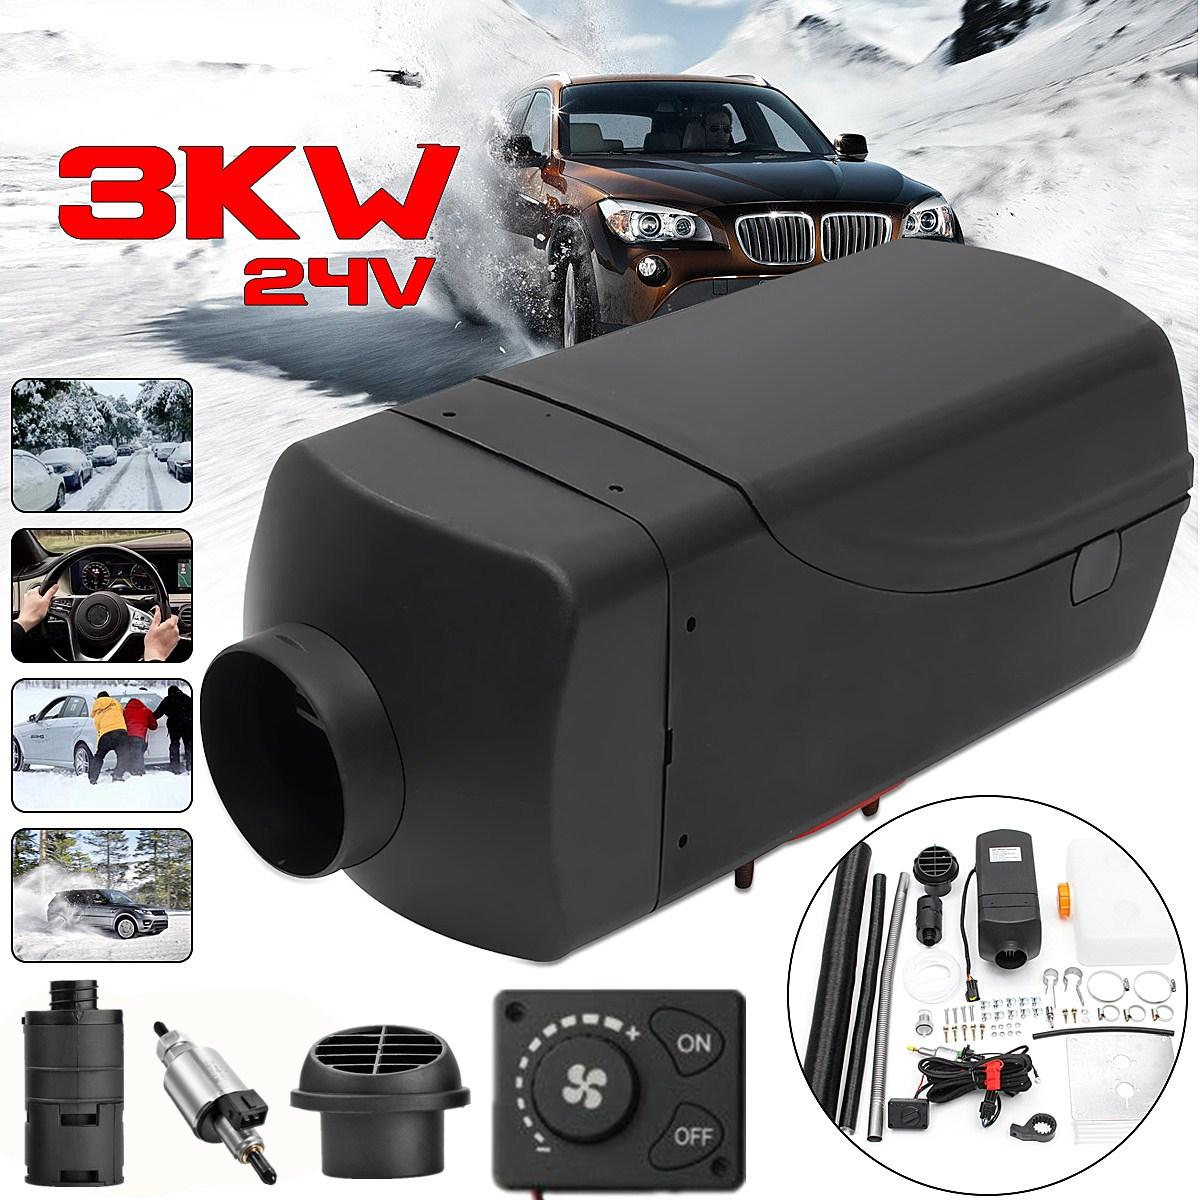 3KW 12V/24V  Car Heater Air Diesel Heater Car Warmer Heating Machine with Digital Switch For Trailer Motorhome Truck Boat Bus